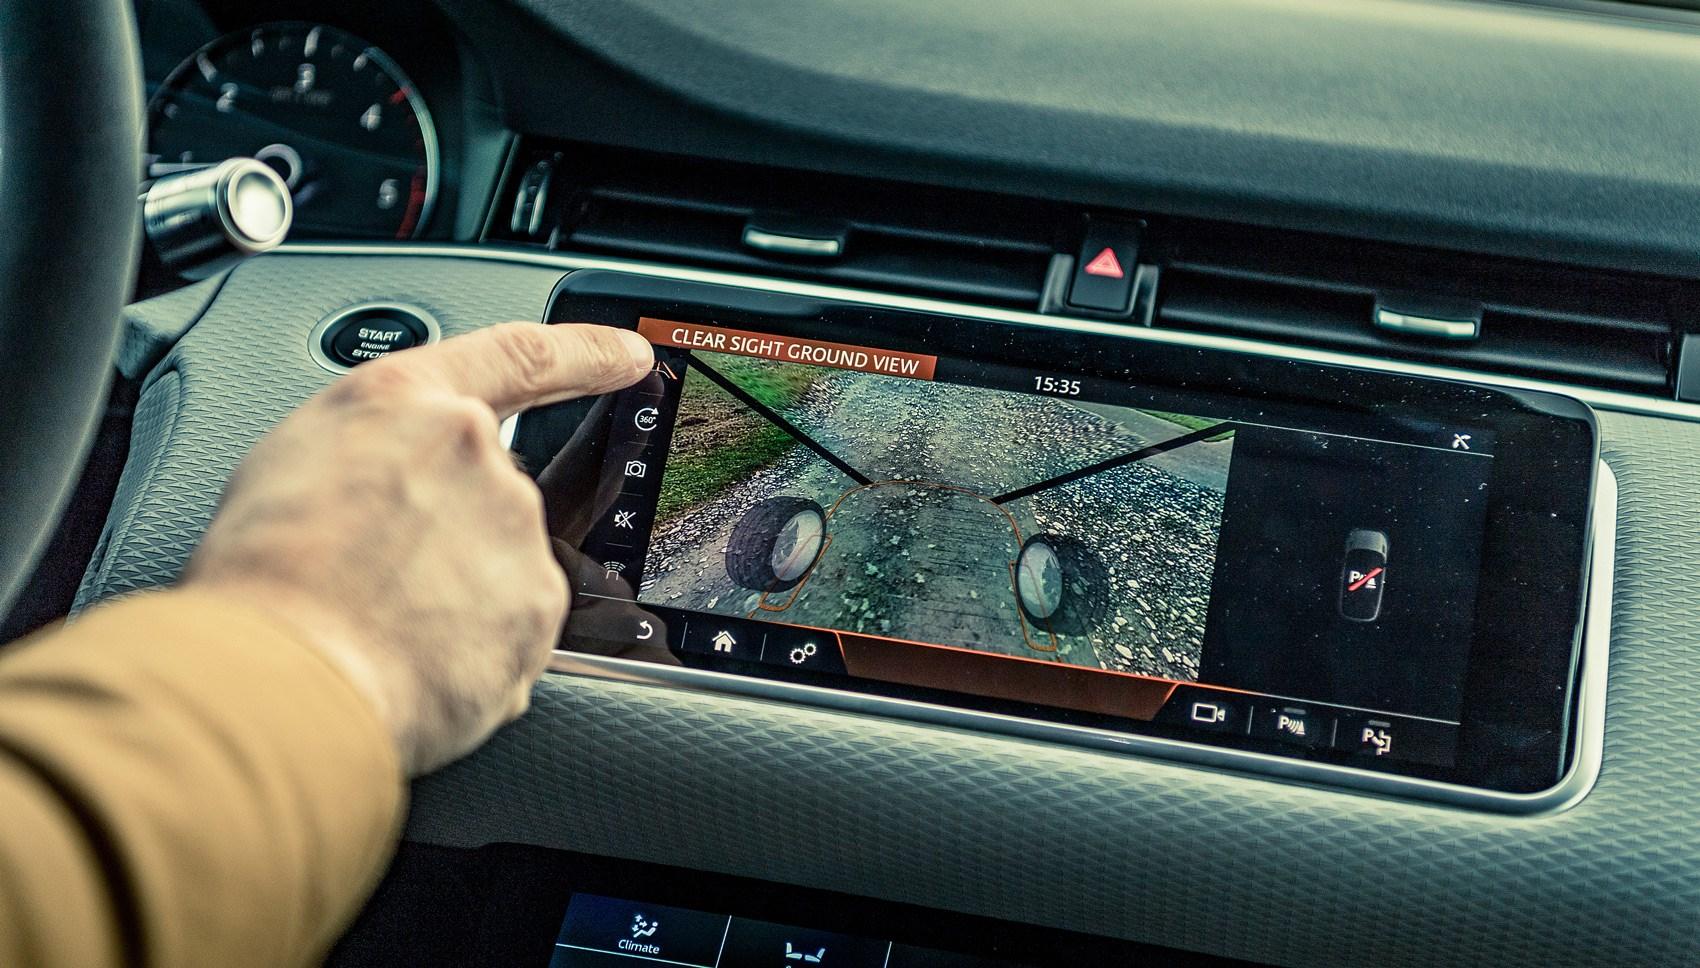 Range Rover Clearsight camera